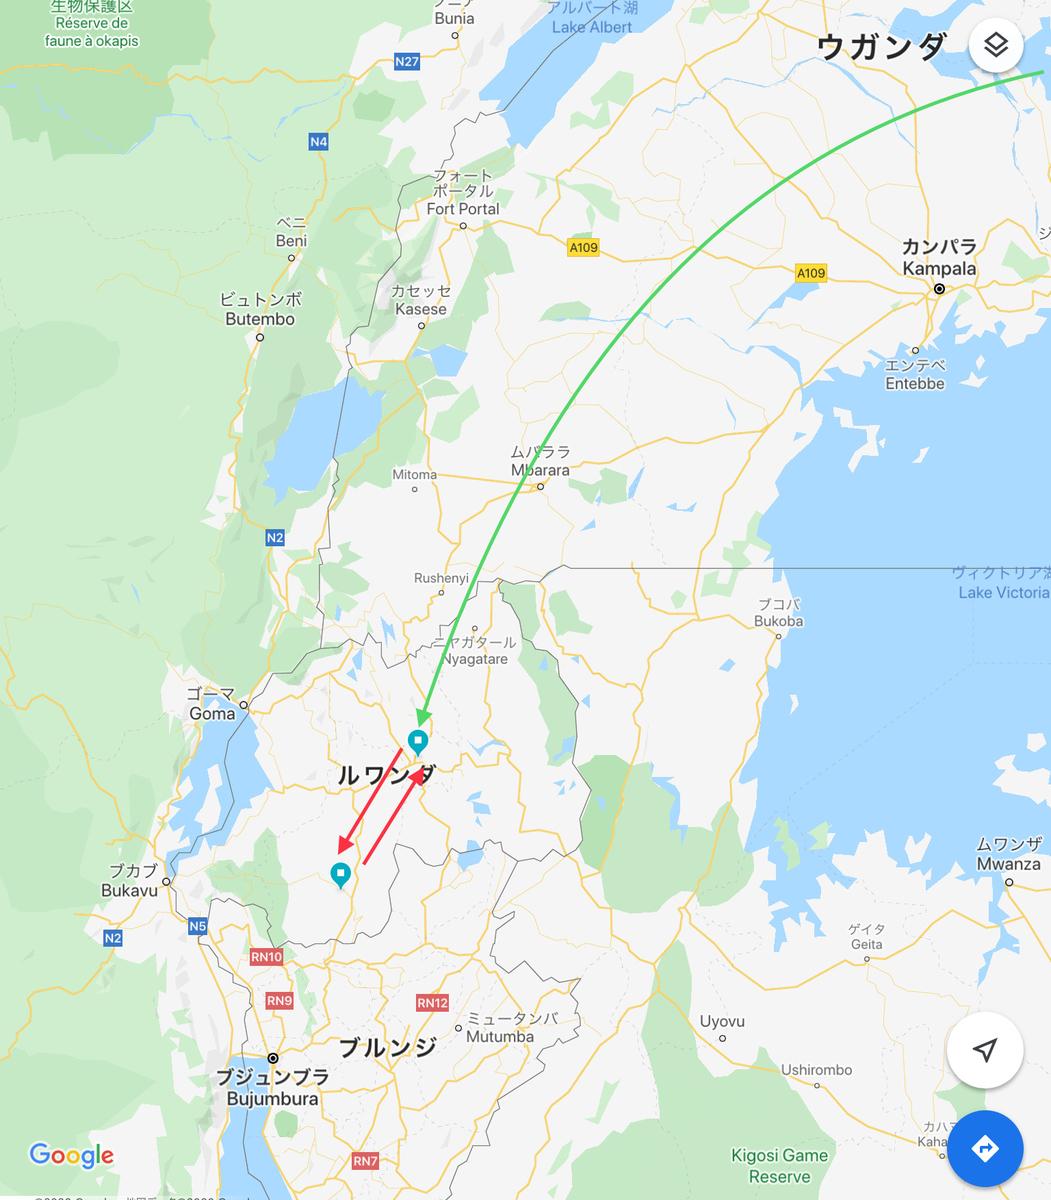 f:id:yusana7:20200117073530j:plain